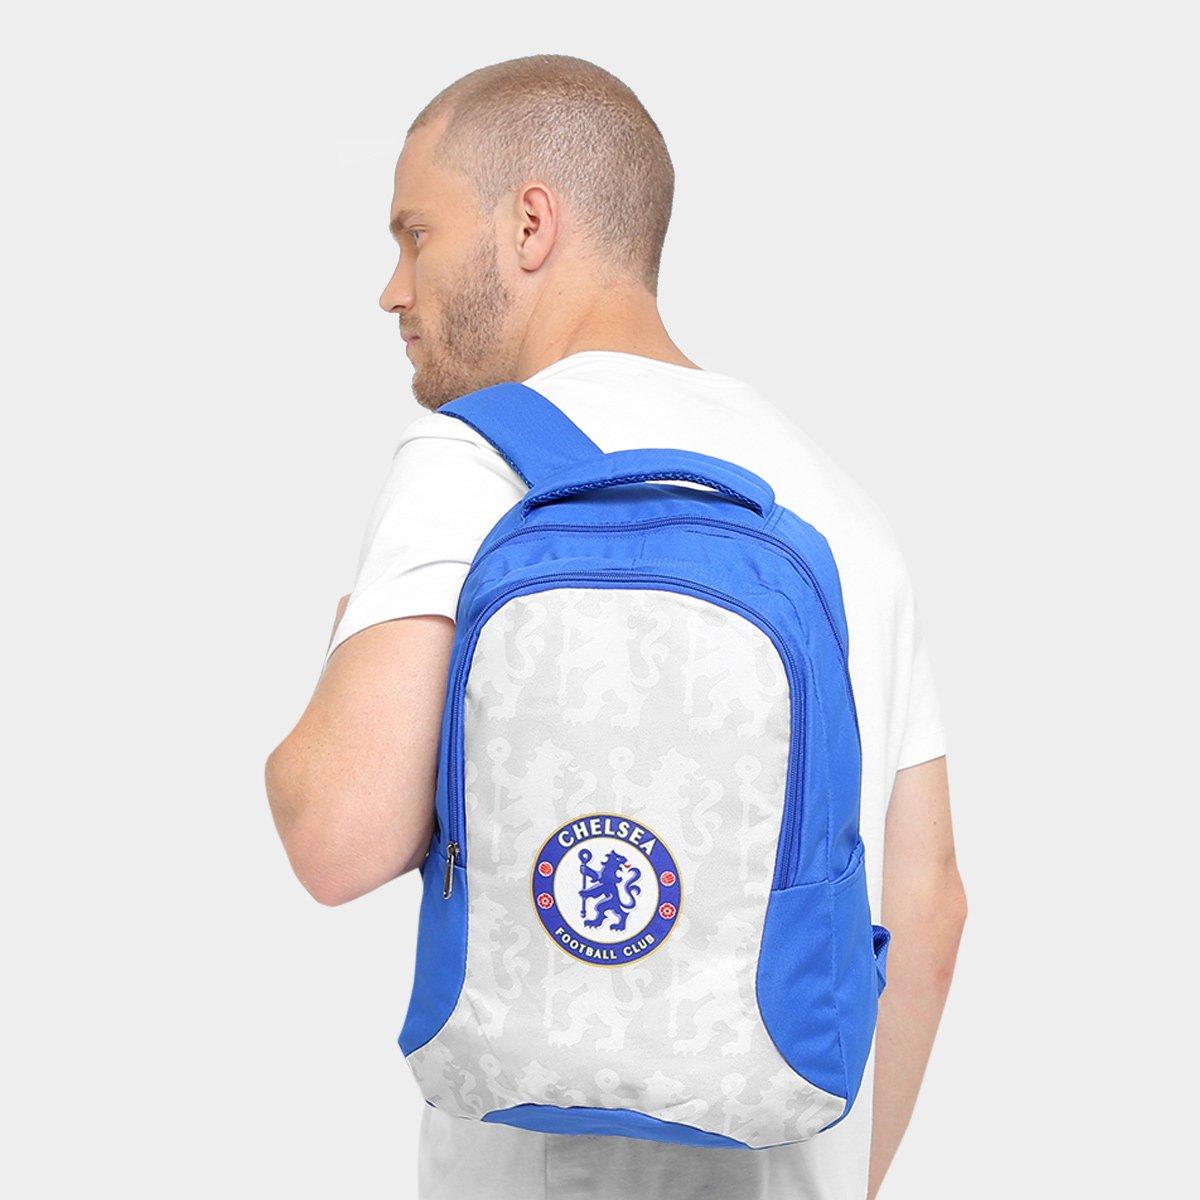 71aa6ced33 ... Mochila Chelsea Esporte  Mochila Chelsea Esporte